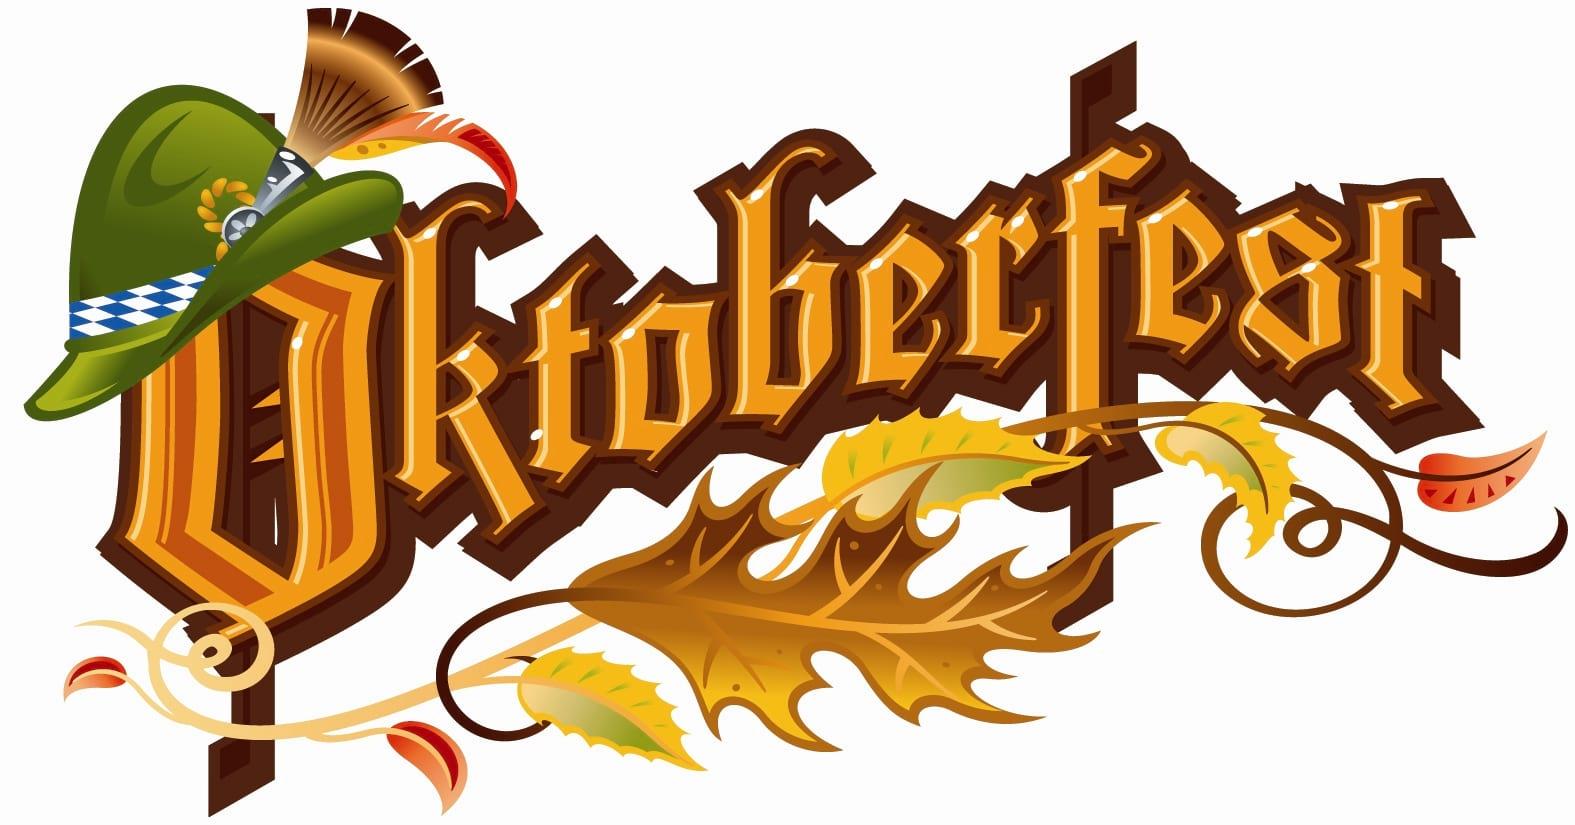 Oktoberfest ingressos betfair 24335